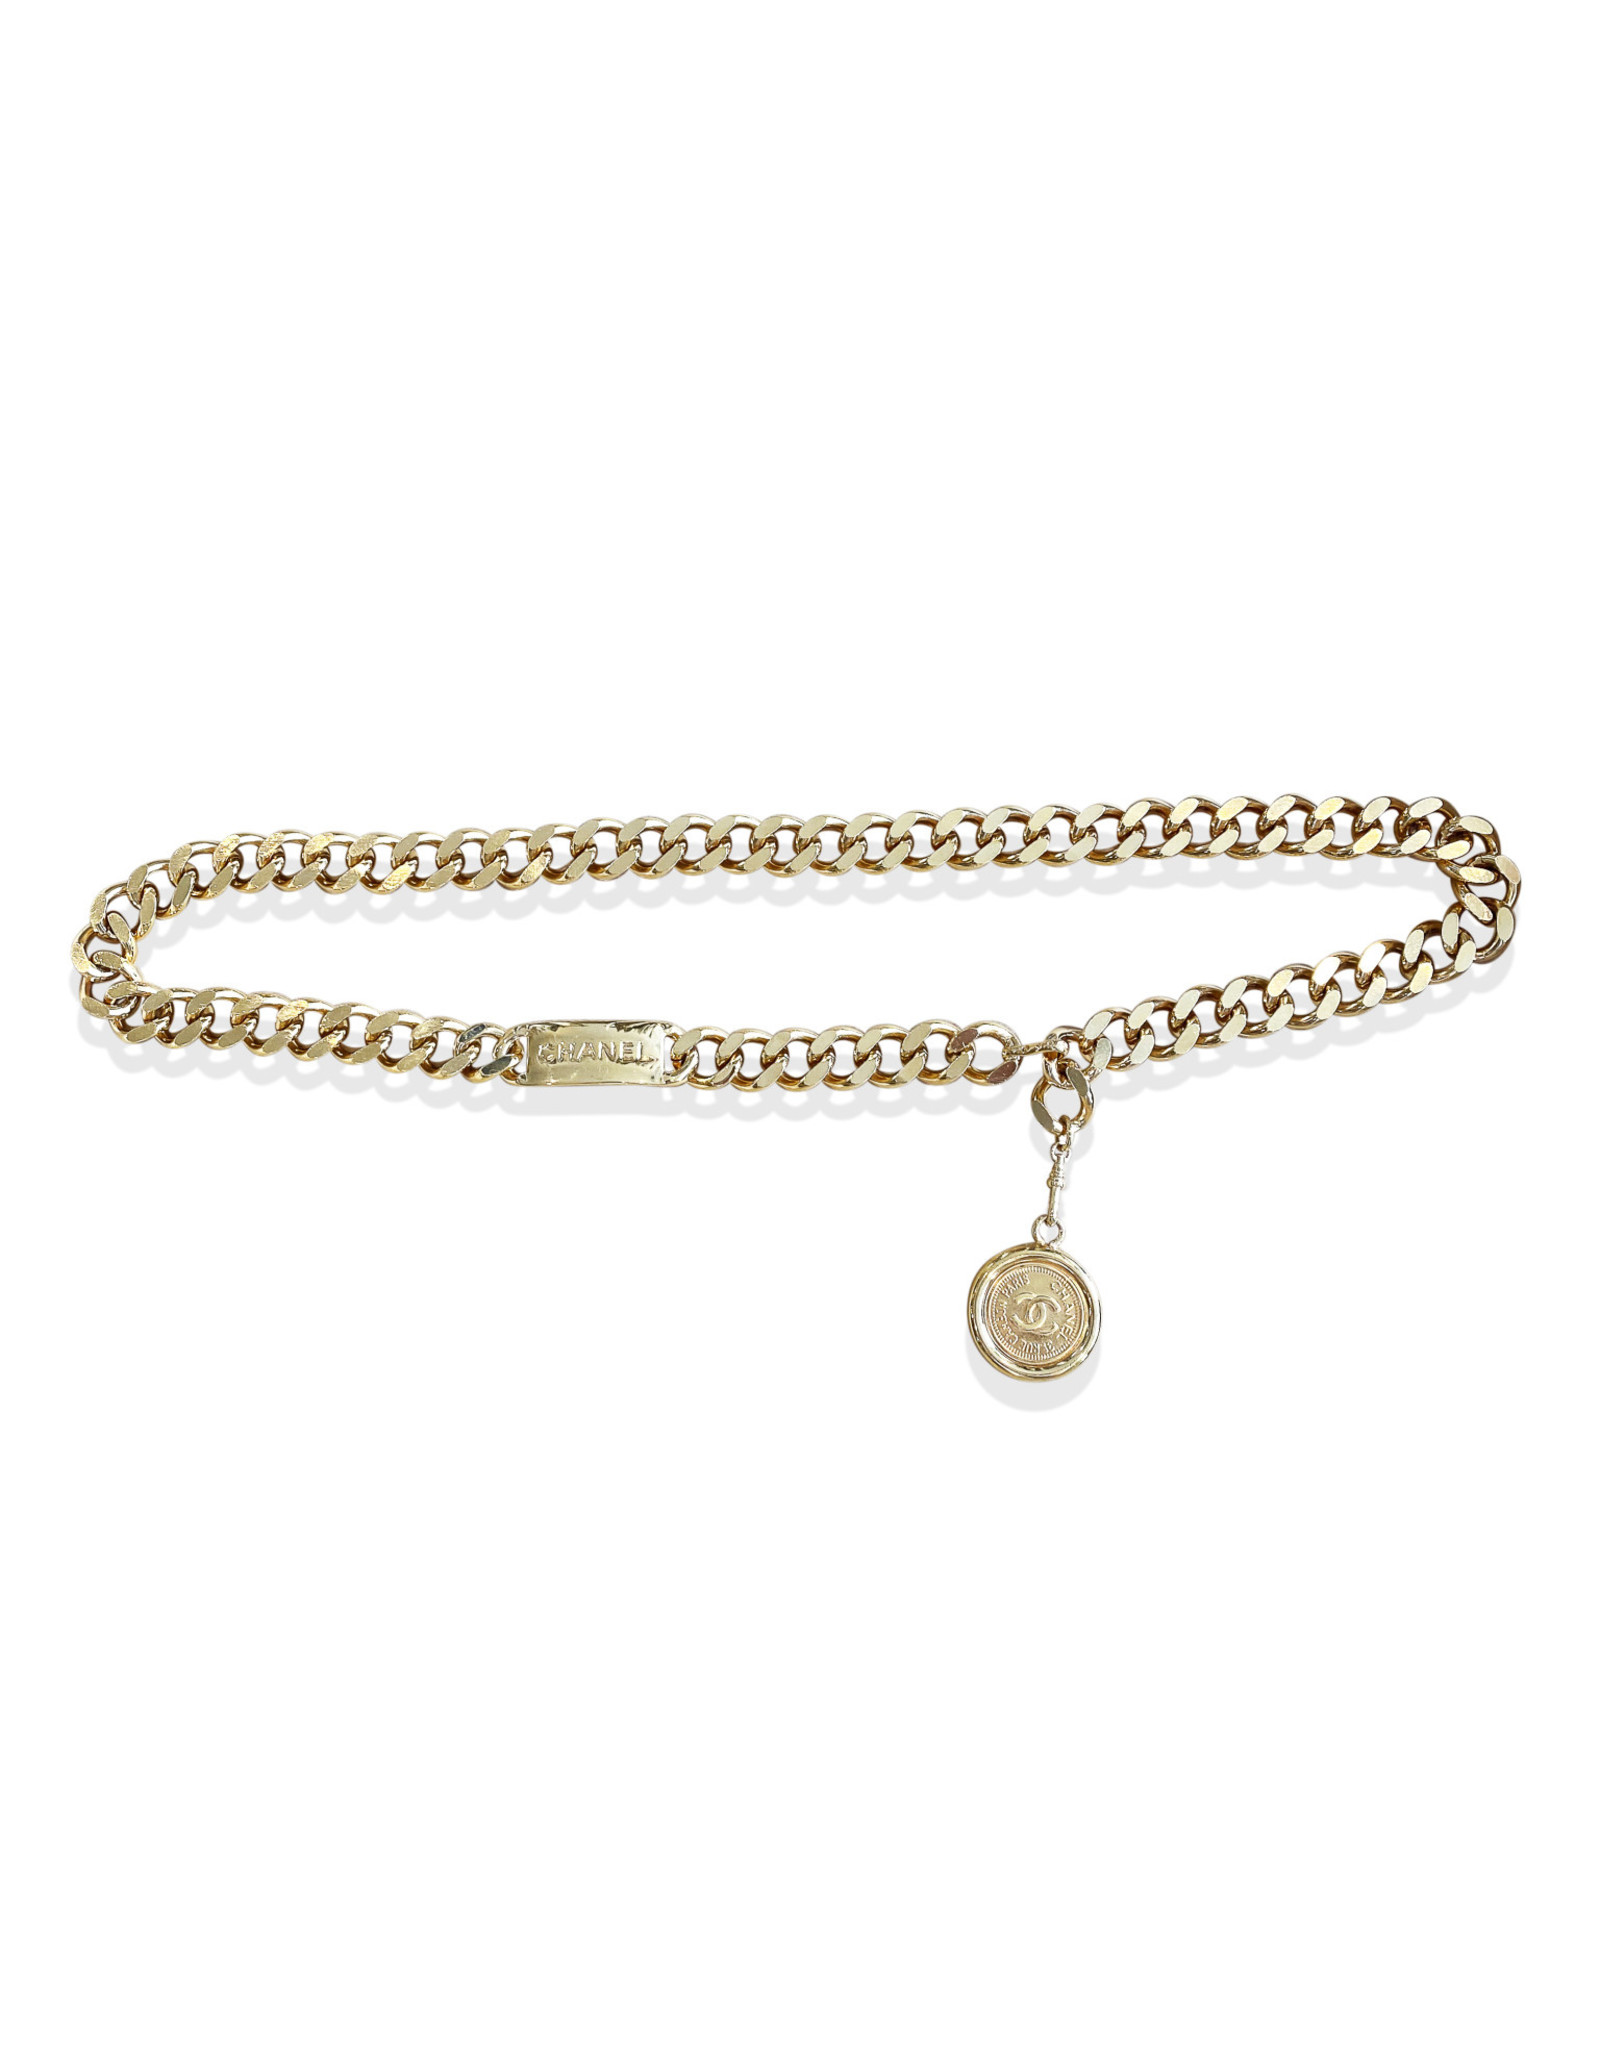 Chanel Chanel Medallion Chain Belt (1994 Vintage)